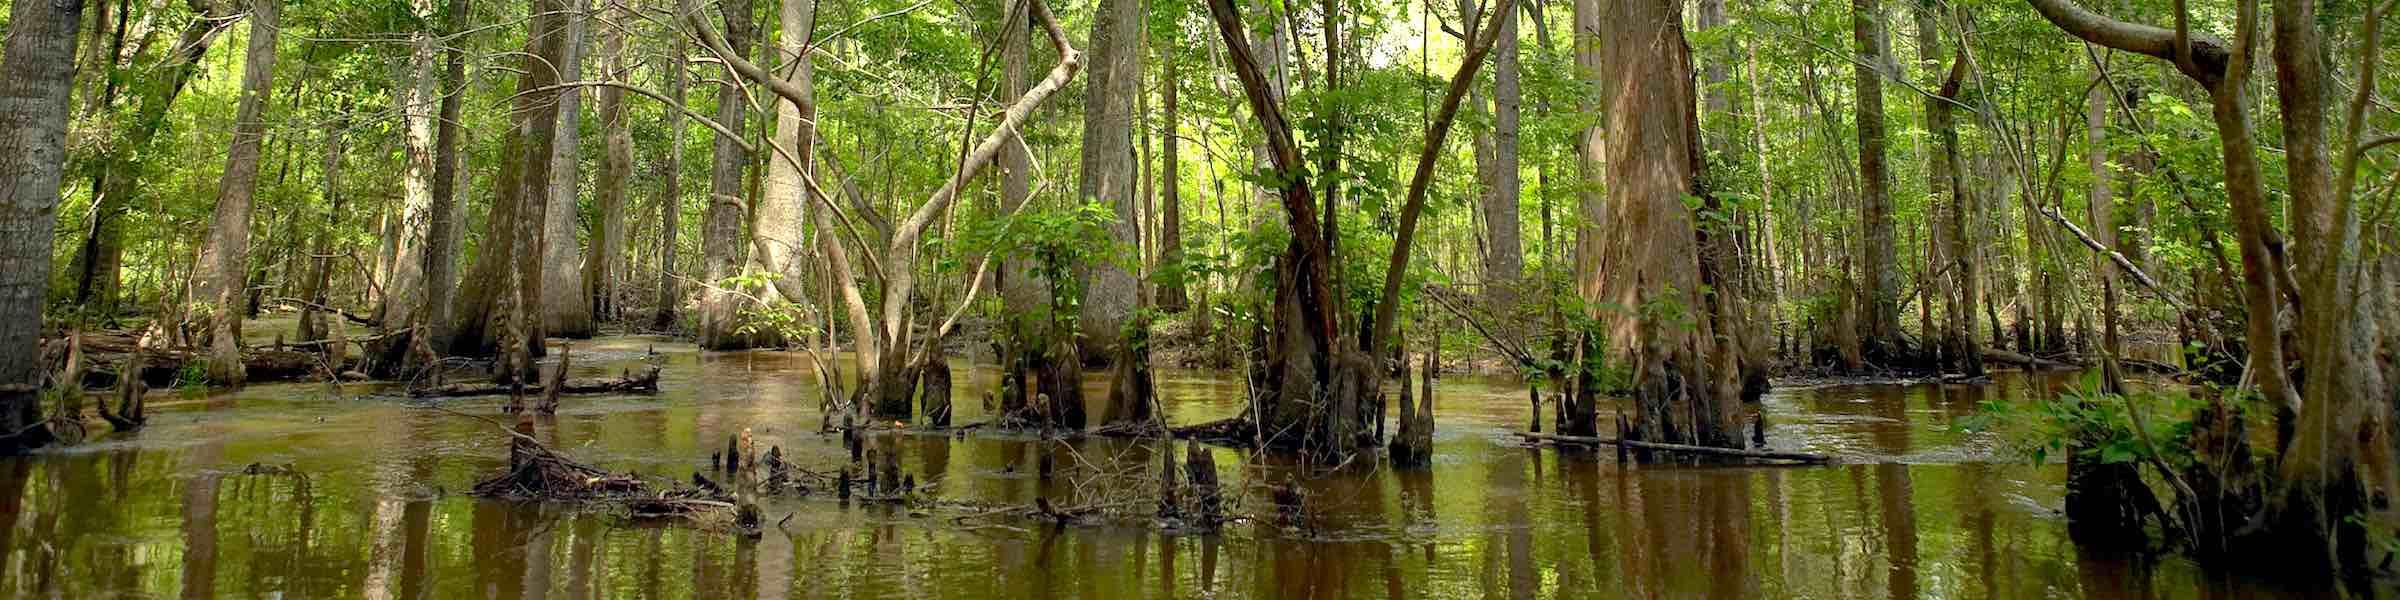 Swamp trees along the Altamaha River, Georgia.